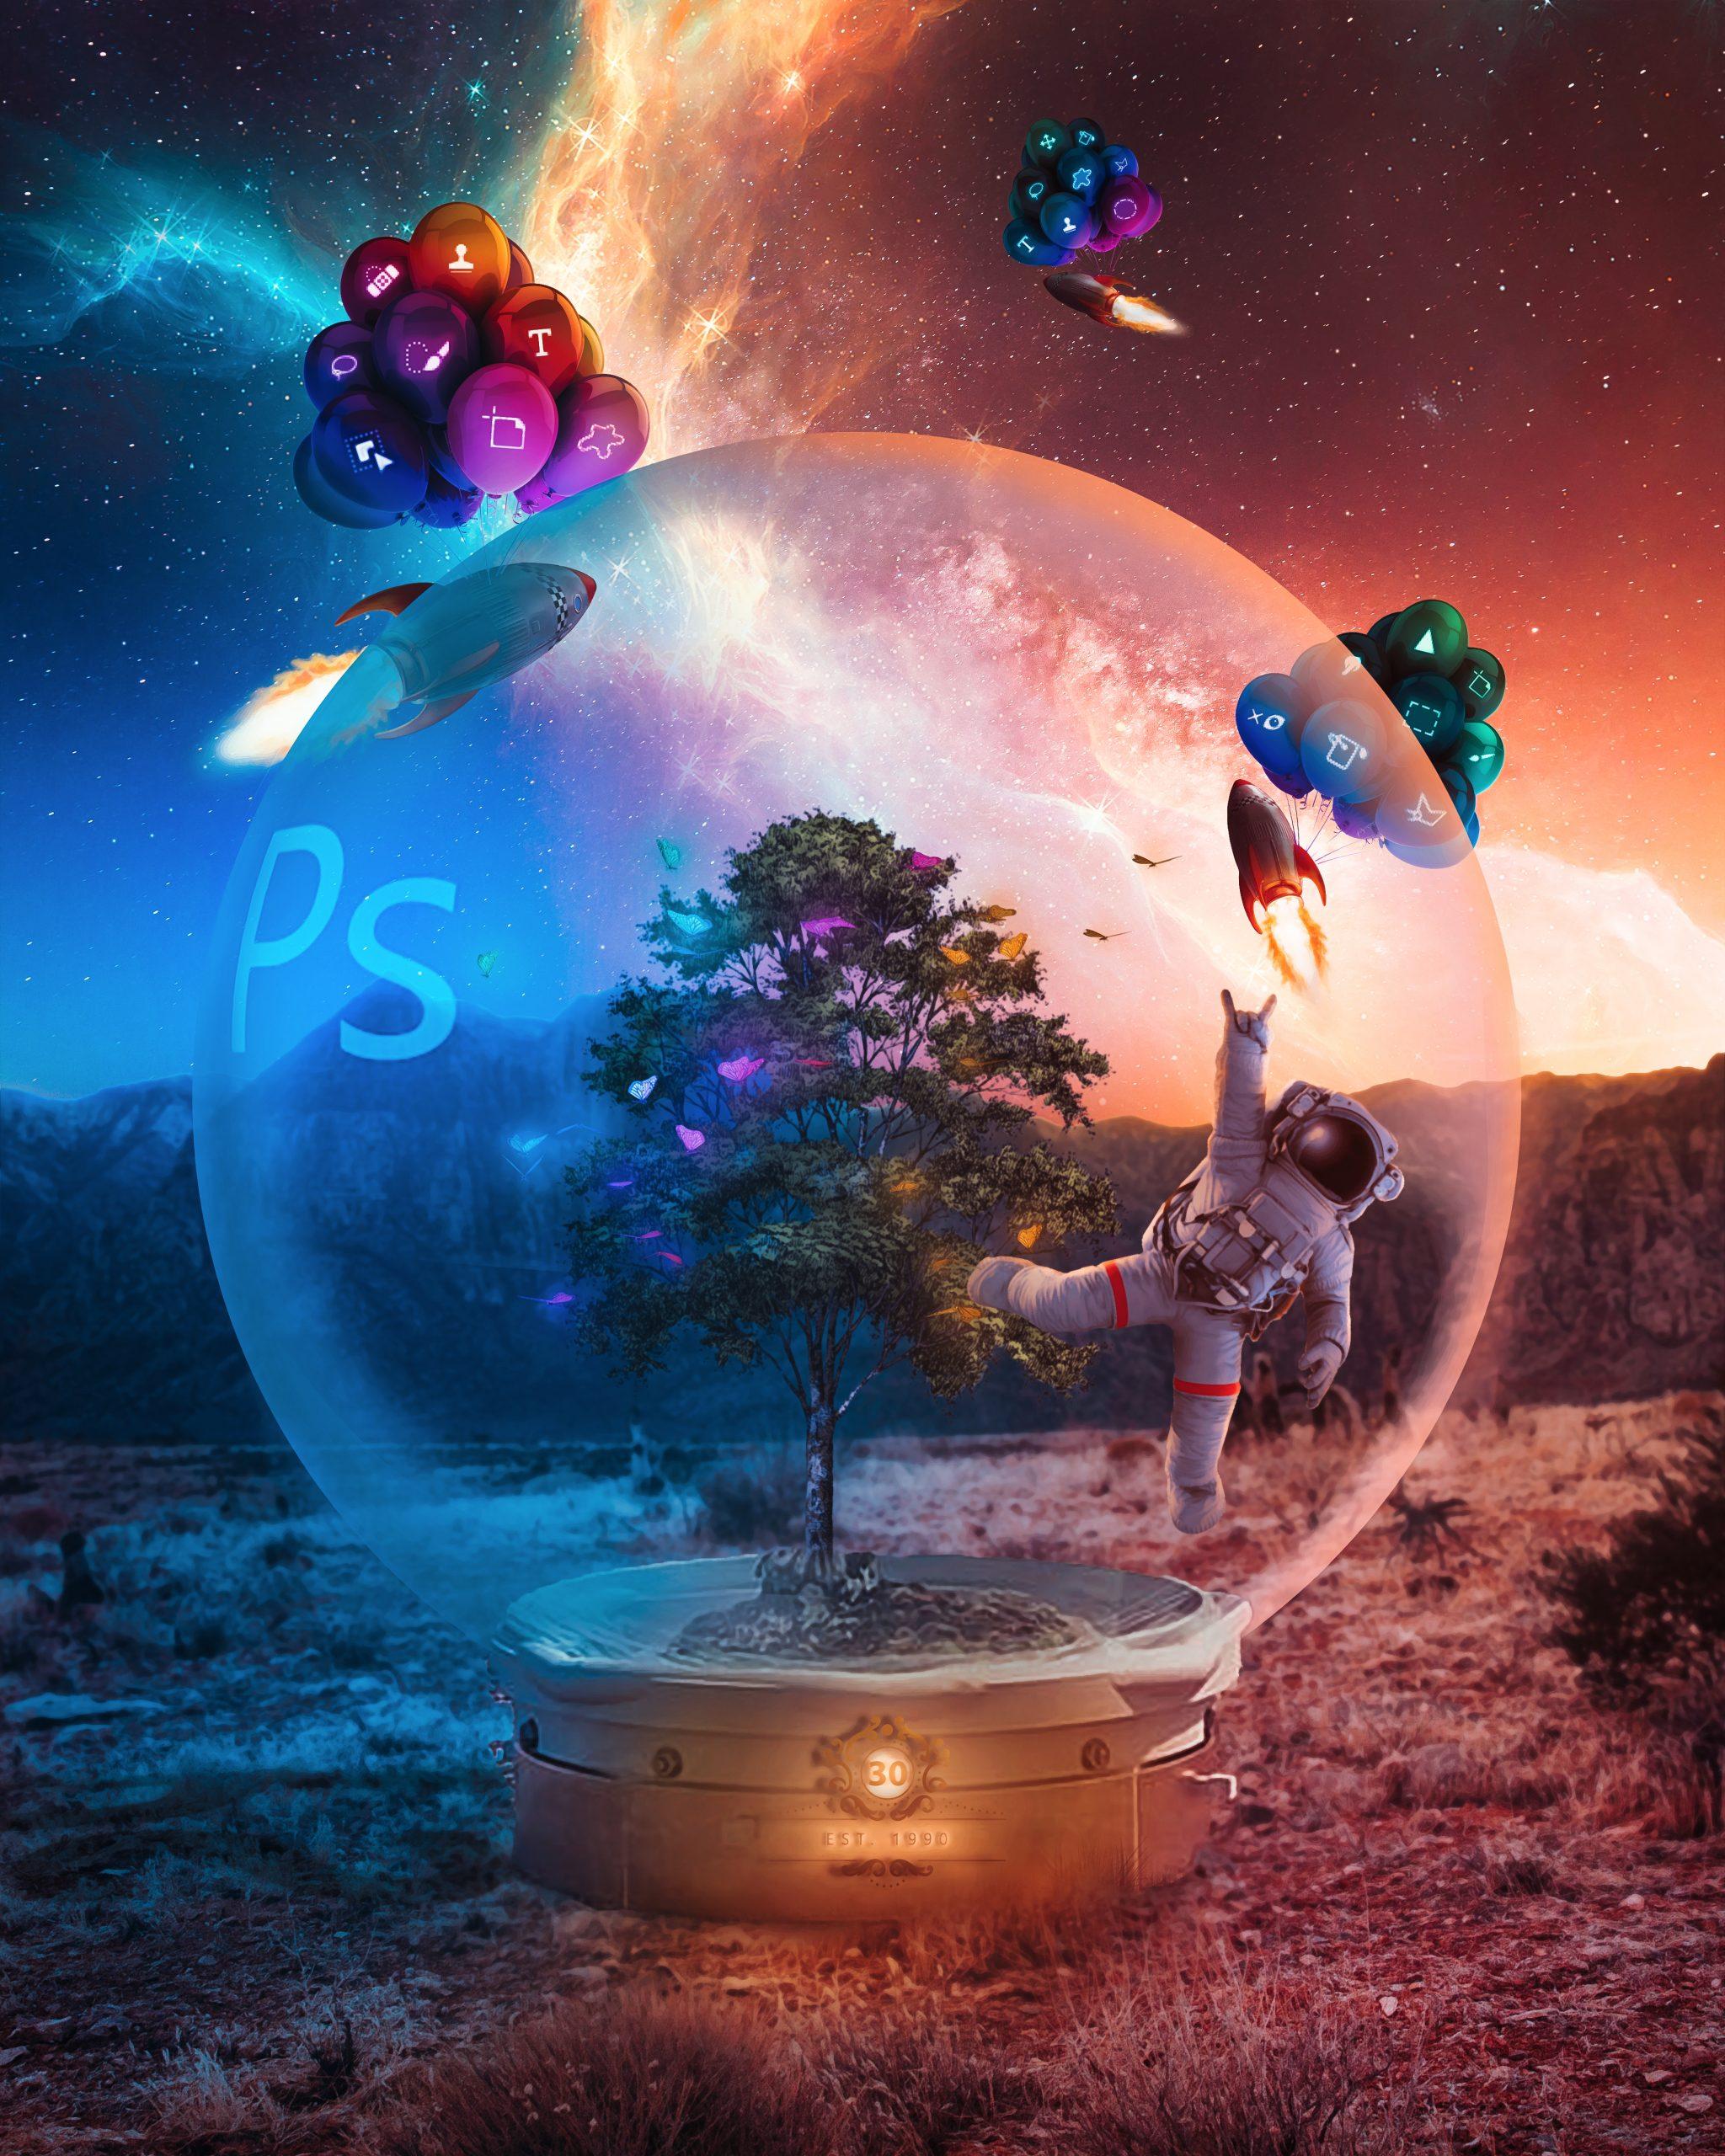 Photoshop_30th_Birthday_Celebration_Image